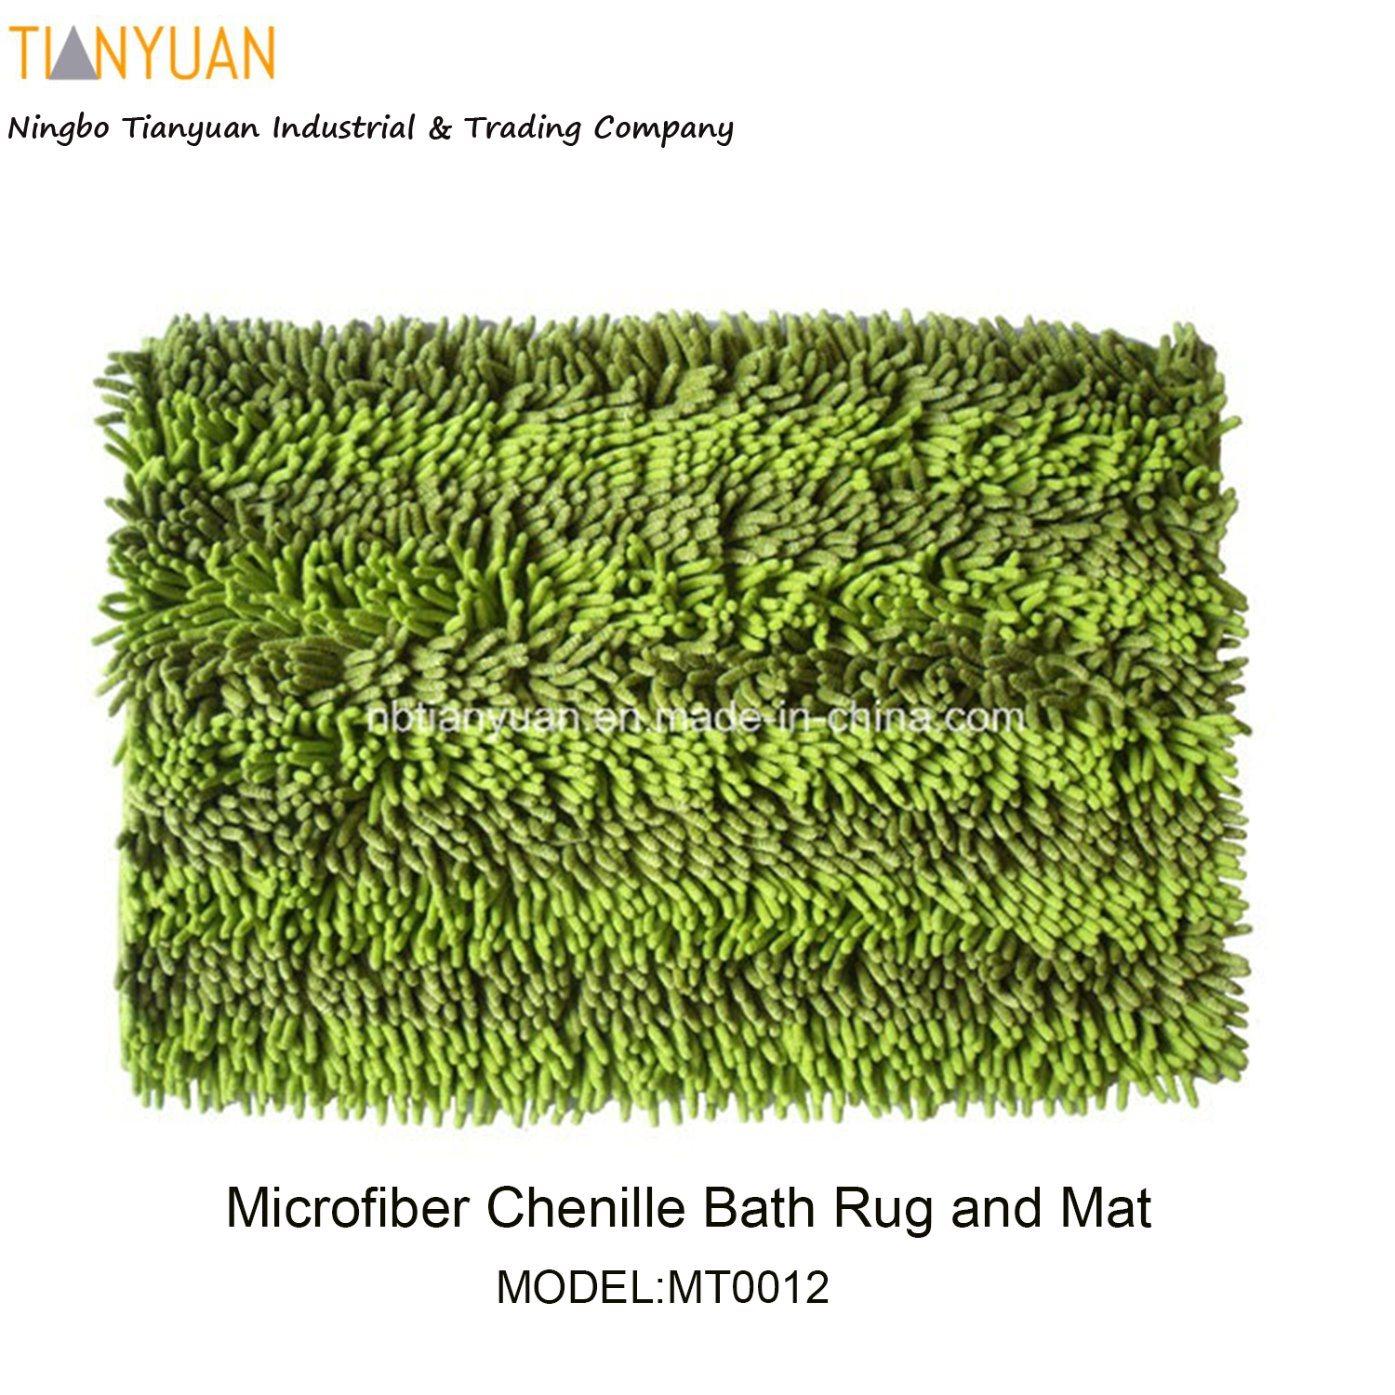 Floor Mat Microfiber Door Mat Microfiber Chenille Bath Rug and Mat